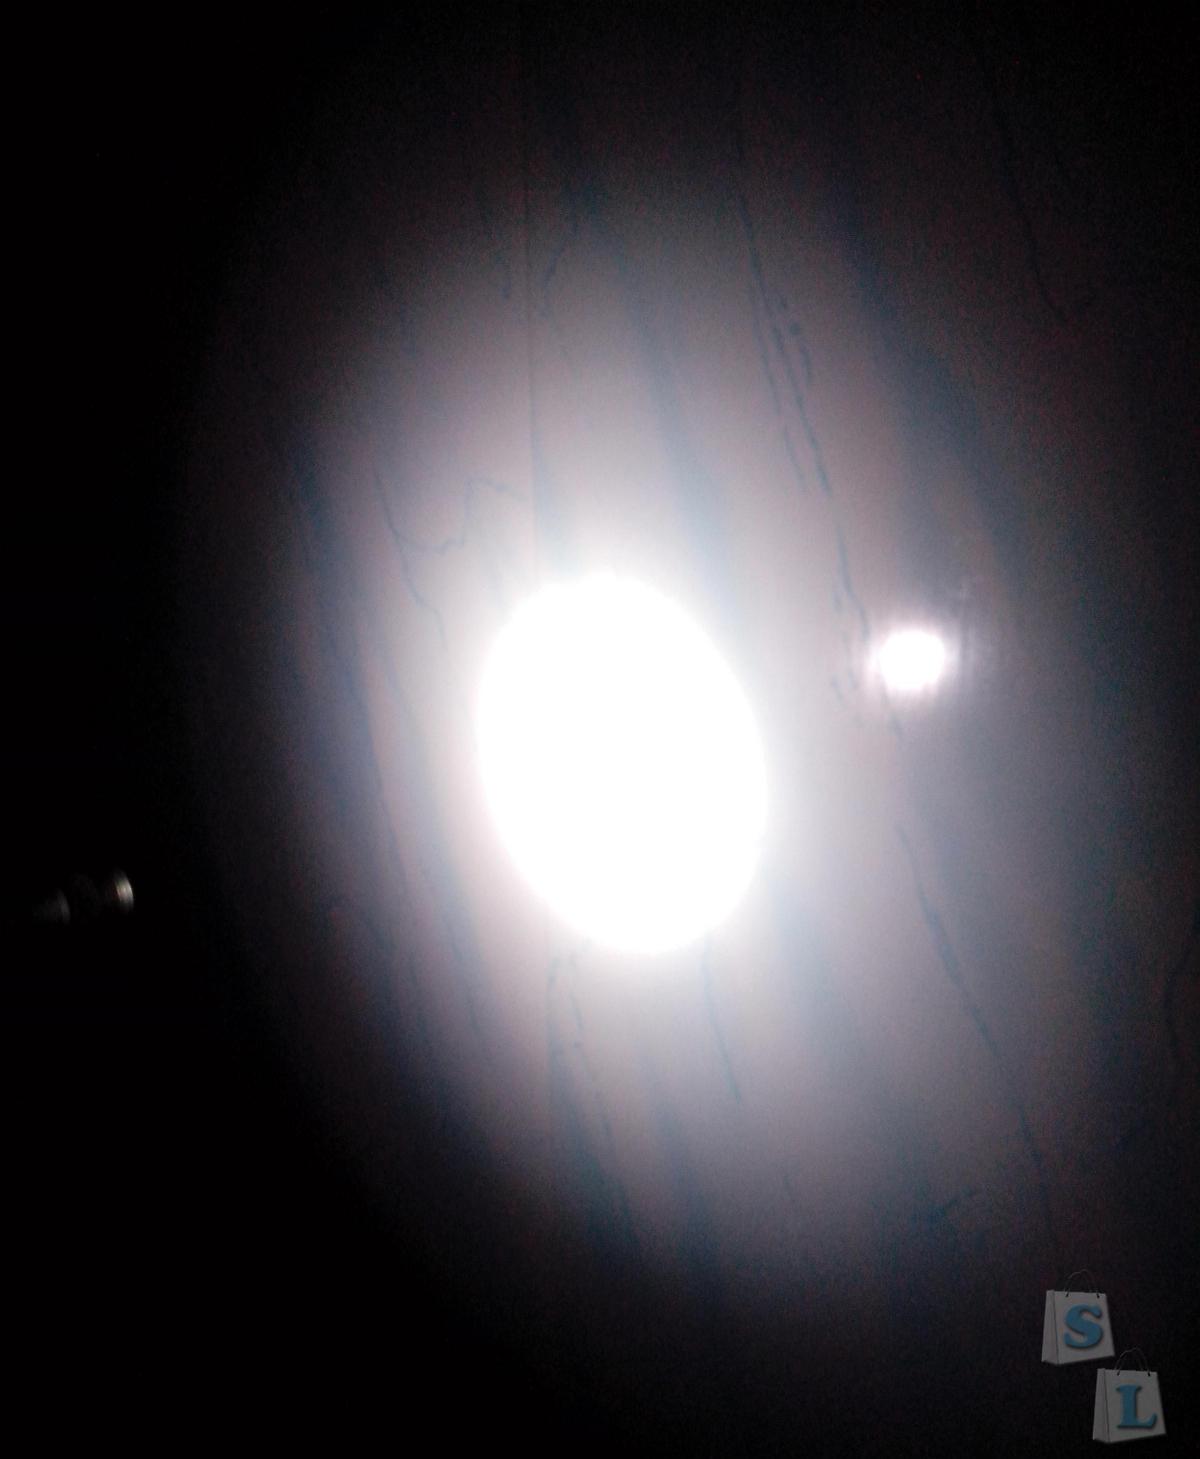 GearBest: Обзор фонарика-наключника на AAA из нержавеющей стали